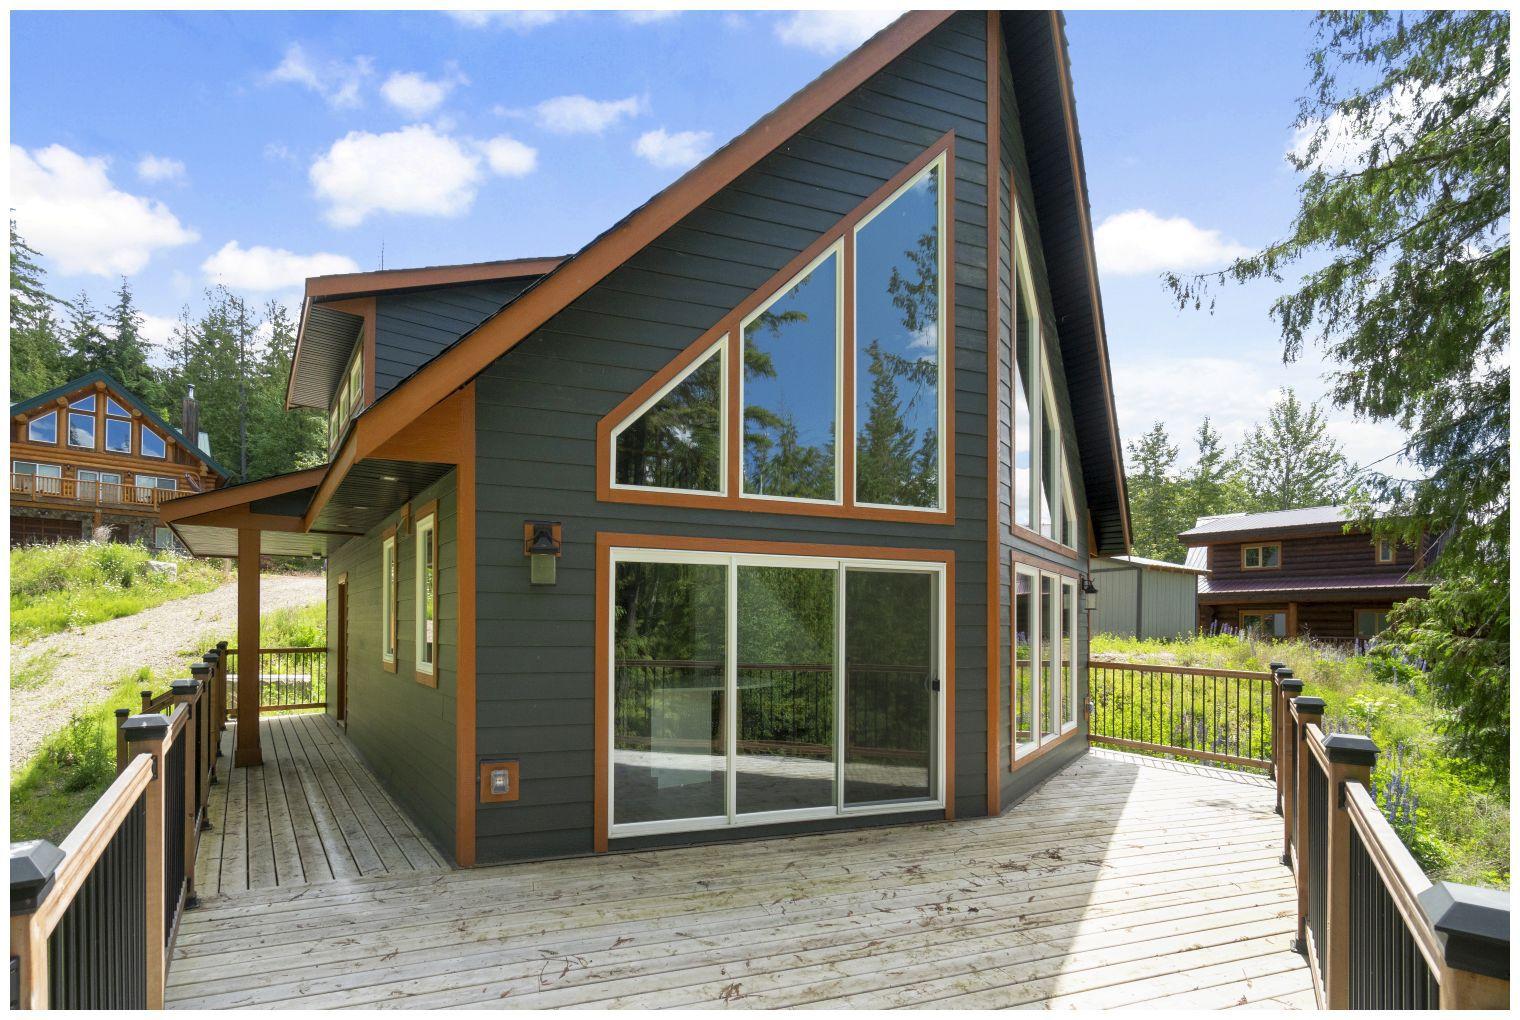 Main Photo: 87 6421 Eagle Bay Road in Eagle Bay: Wild Rose Bay House for sale (Shuswap Lake)  : MLS®# 10185422